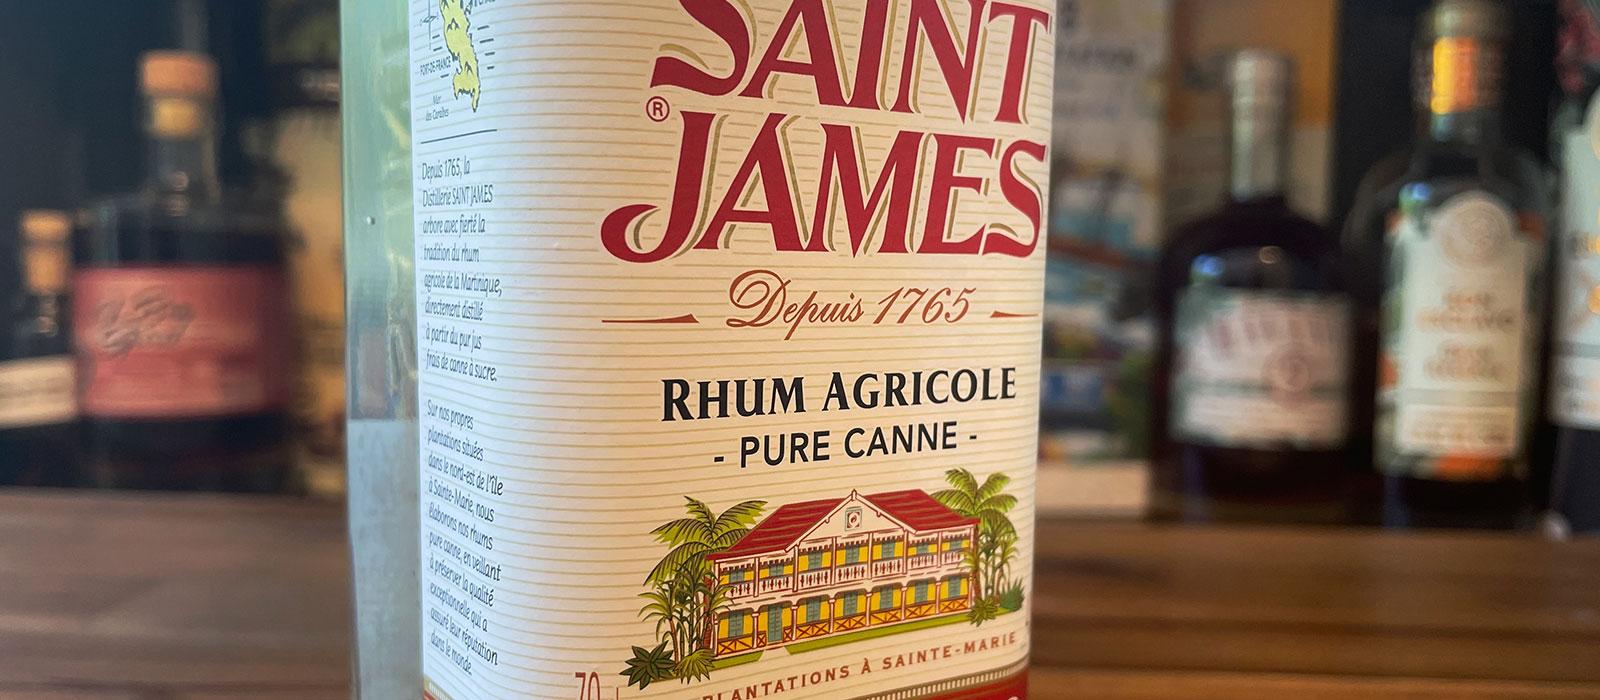 Saint James Impérial Blanc Rhum Agricole lanserad på Systembolaget